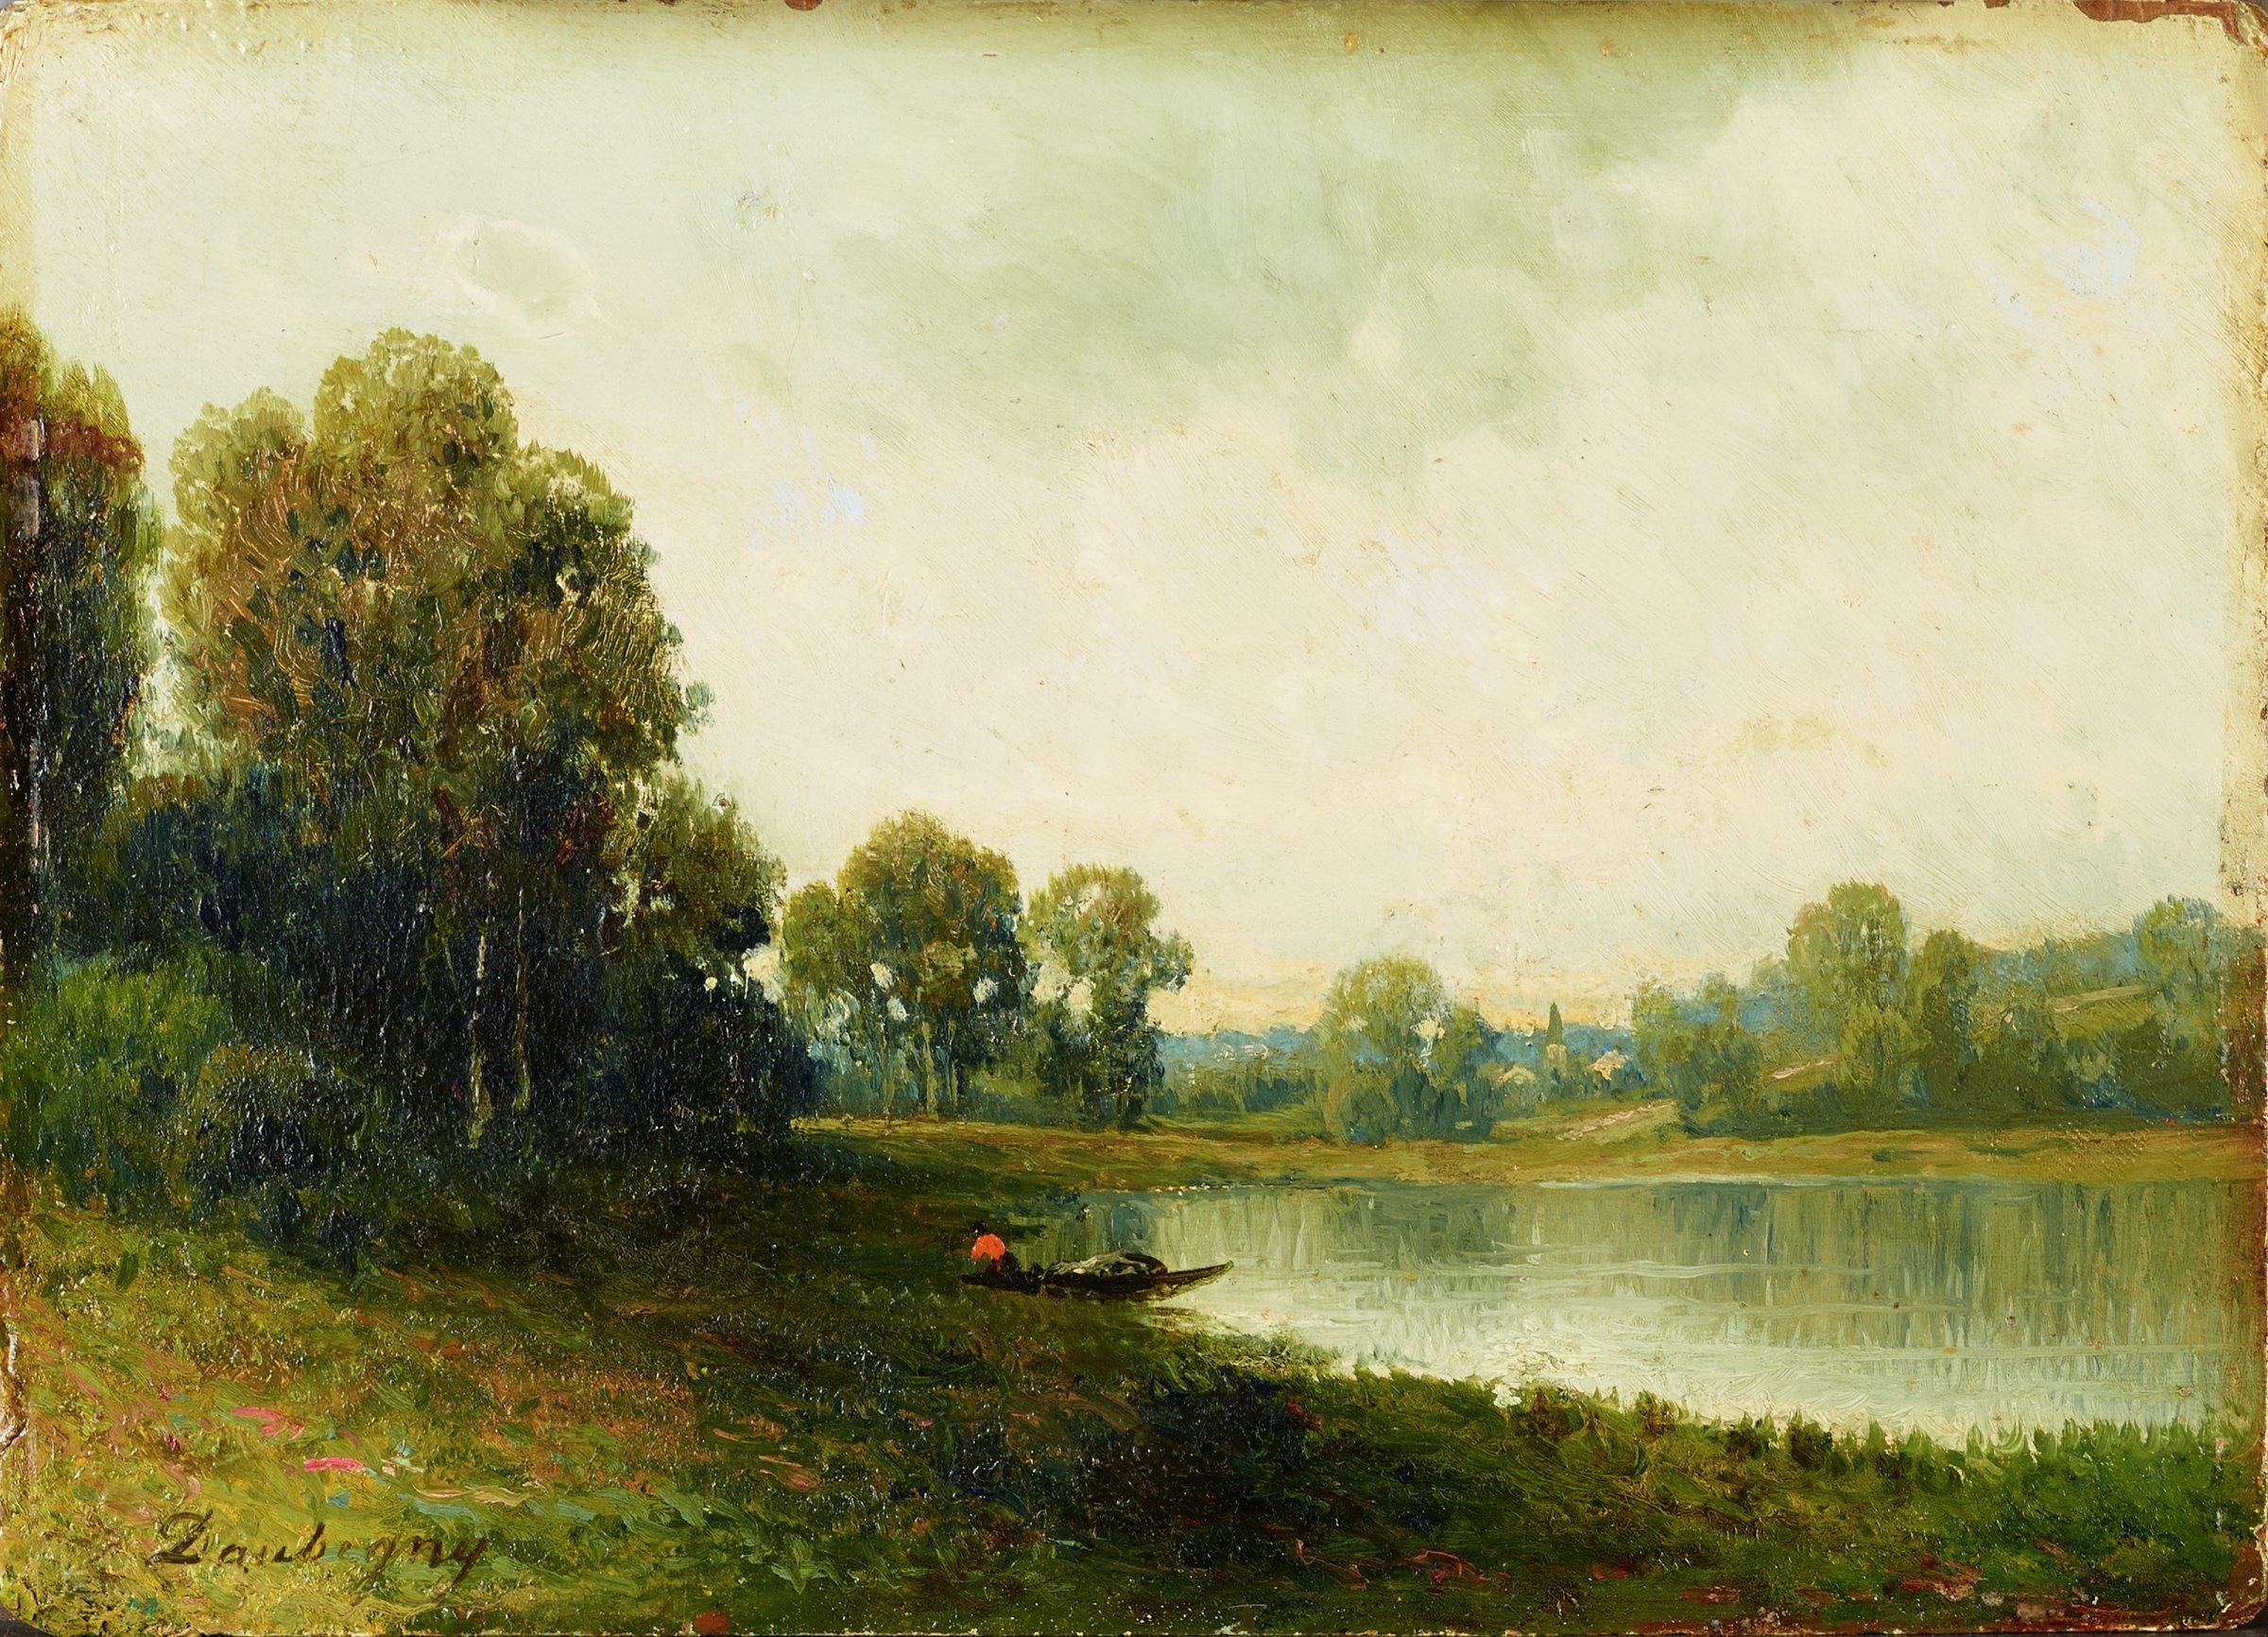 Landscape, Charles François Daubigny, oil on panel